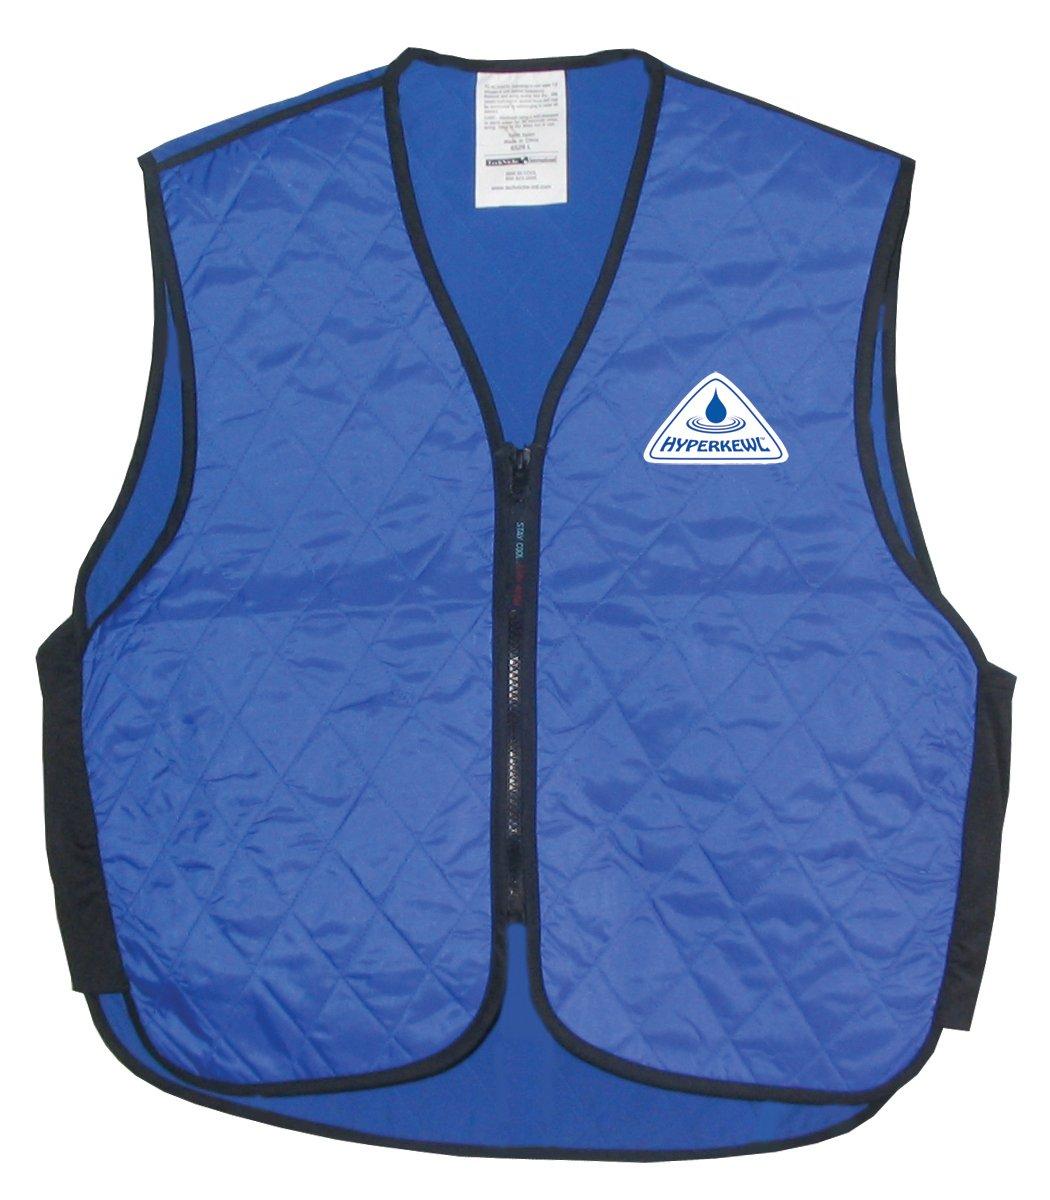 TechNiche International Adult HyperKewl Cooling Sport Vest, Small, Royal Blue